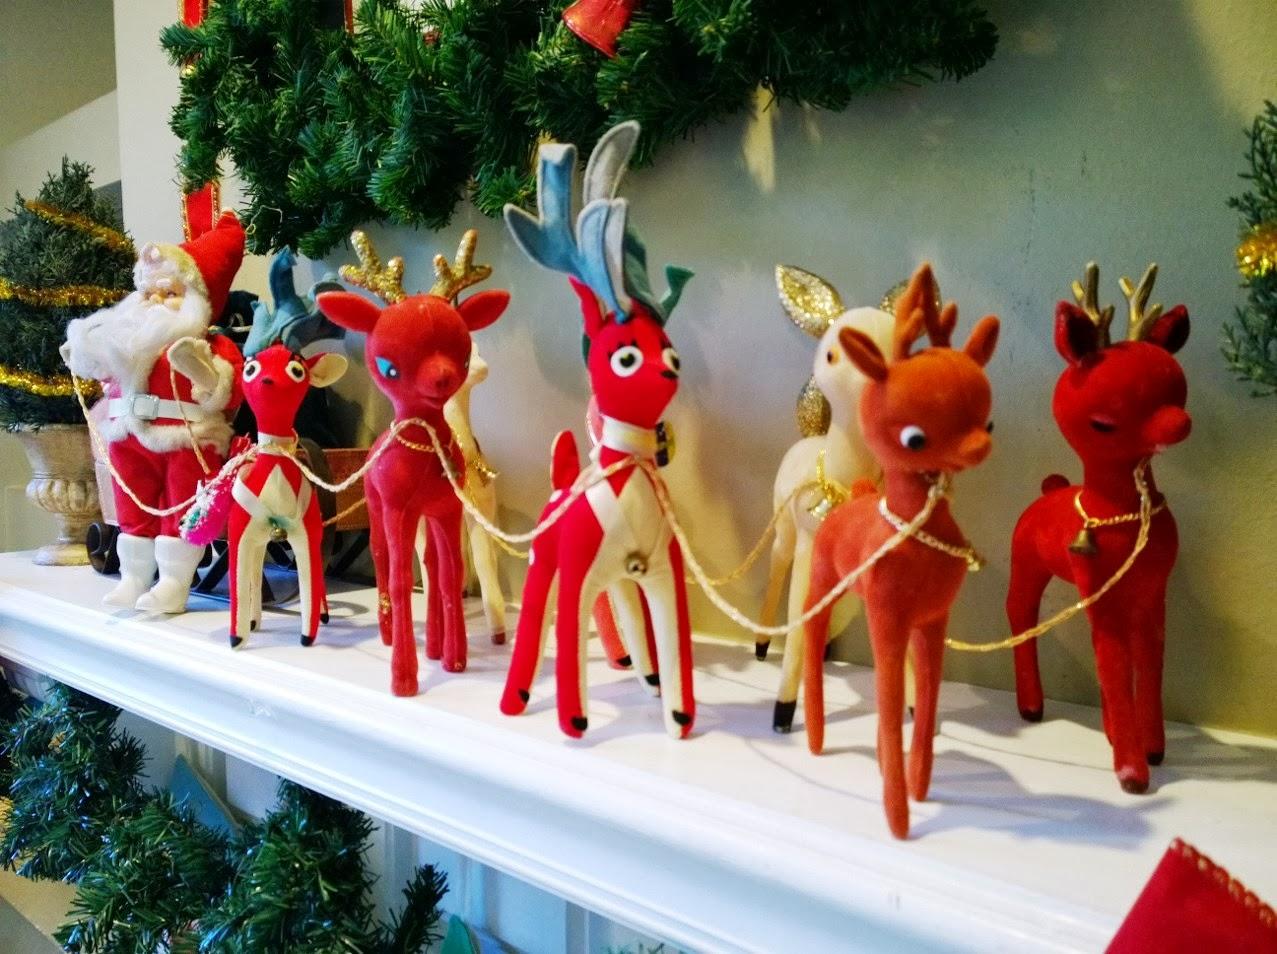 Corey Moortgat- Collage Artist: My Christmas House, Part 2